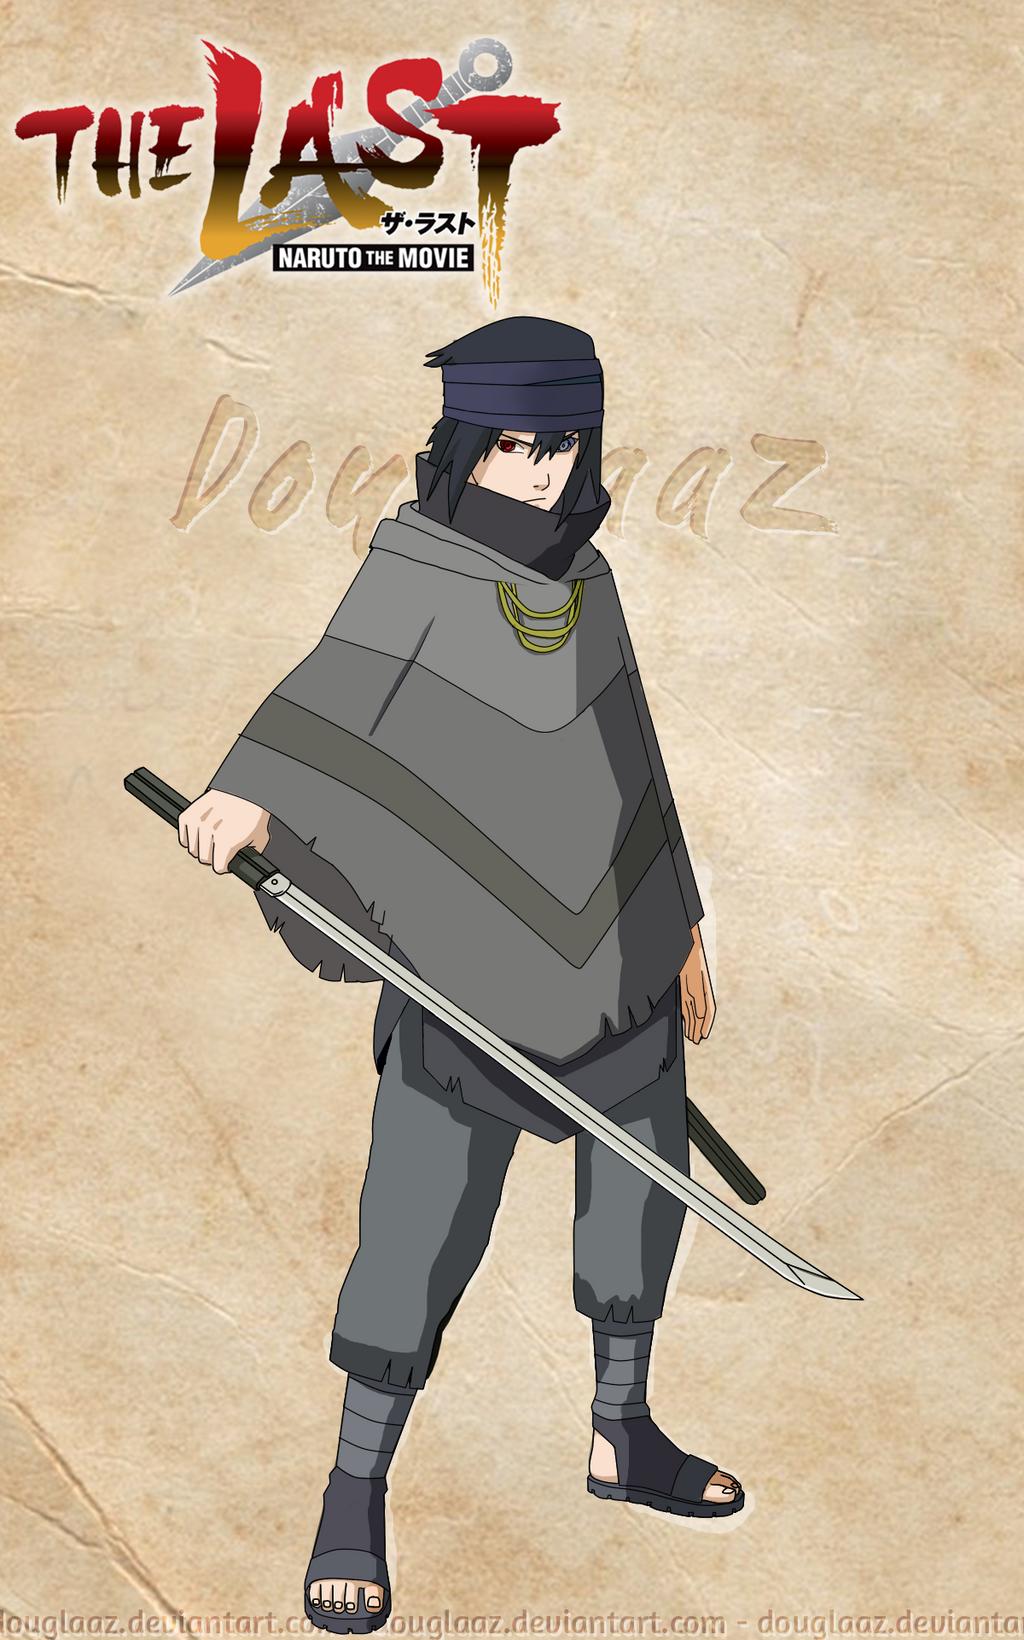 Sasuke - The Last: Naruto the Movie by douglaaz on DeviantArt